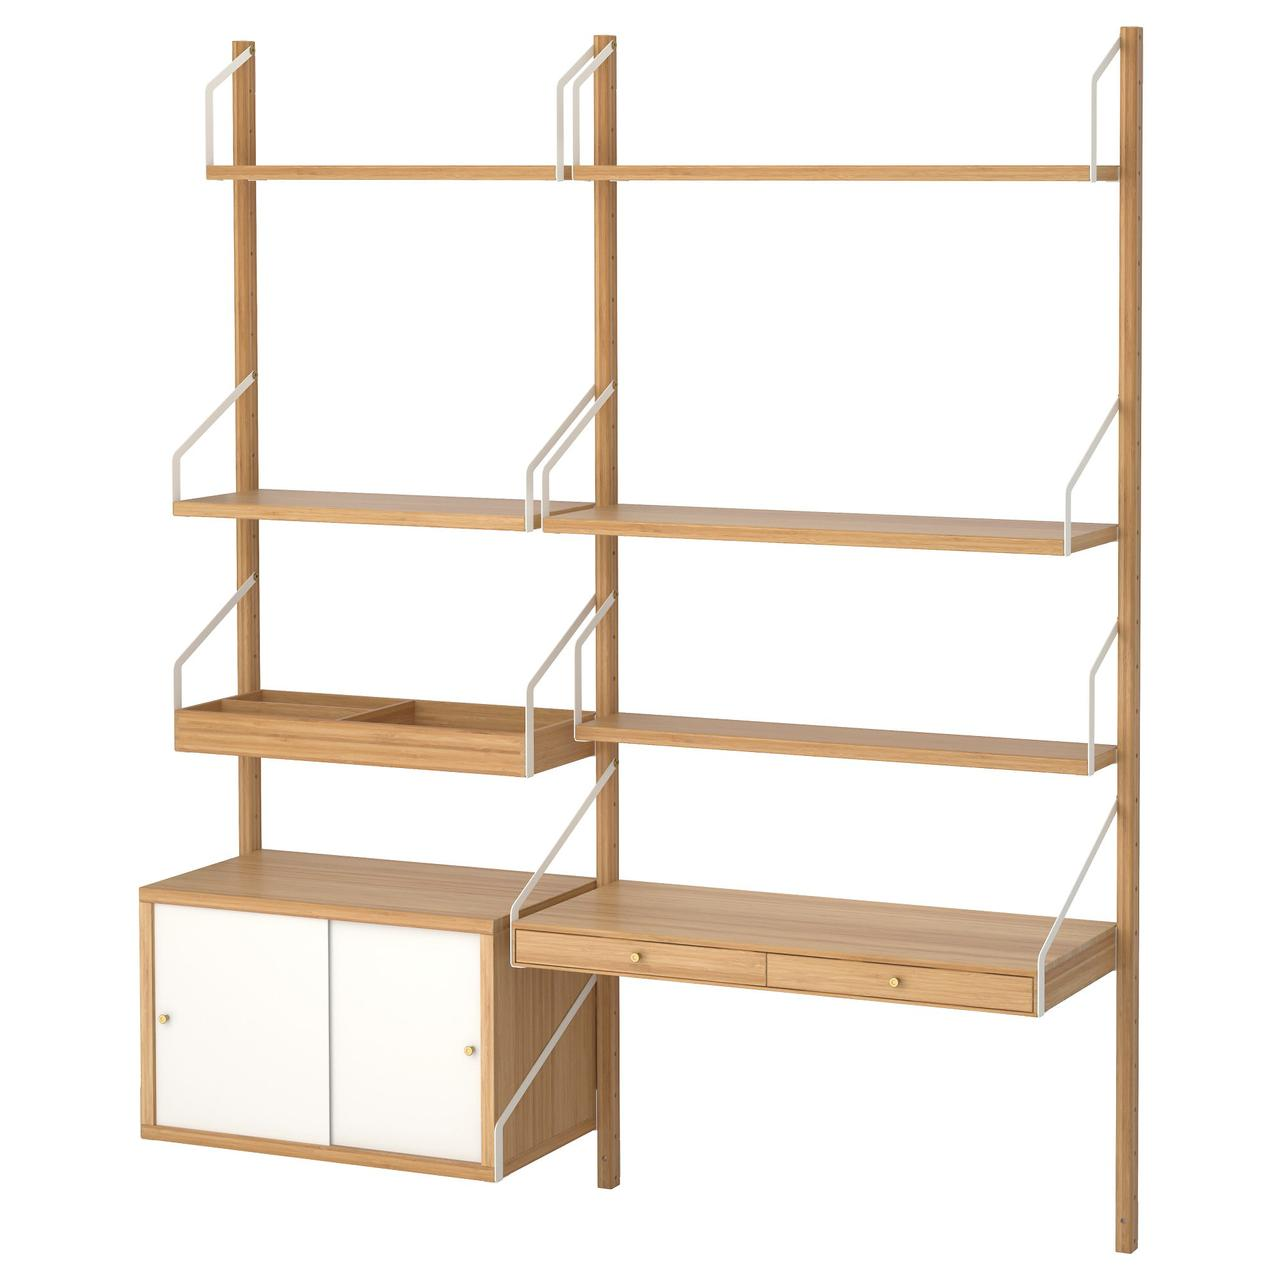 Стол IKEA SVALNÄS 150x35x176 см с креплением к стене бамбук белый 291.844.52